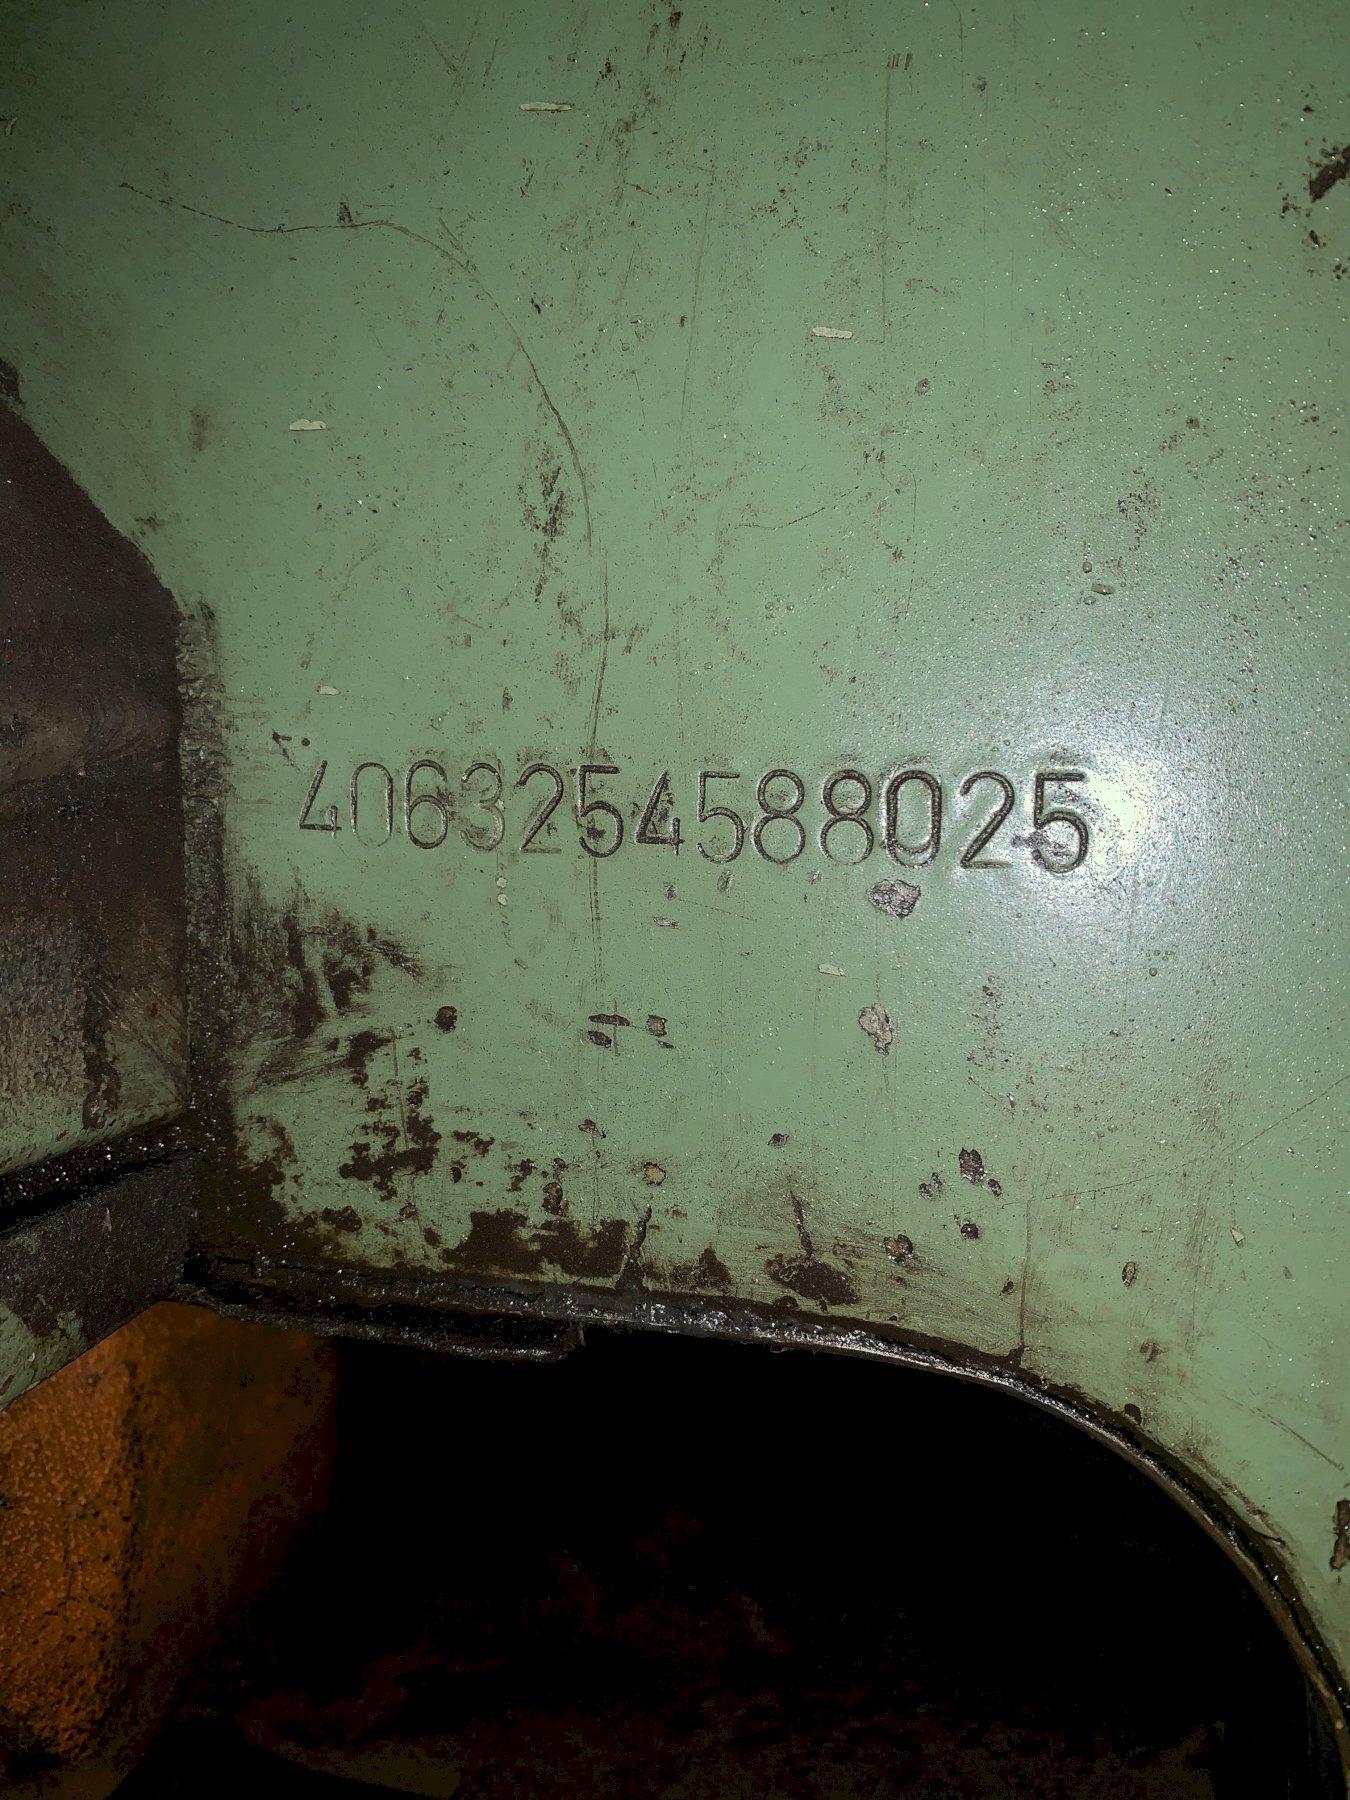 2751fae77b24c37382cf6464173d145e-423a85cd6e5c50f24fa443ed865268f9.jpeg